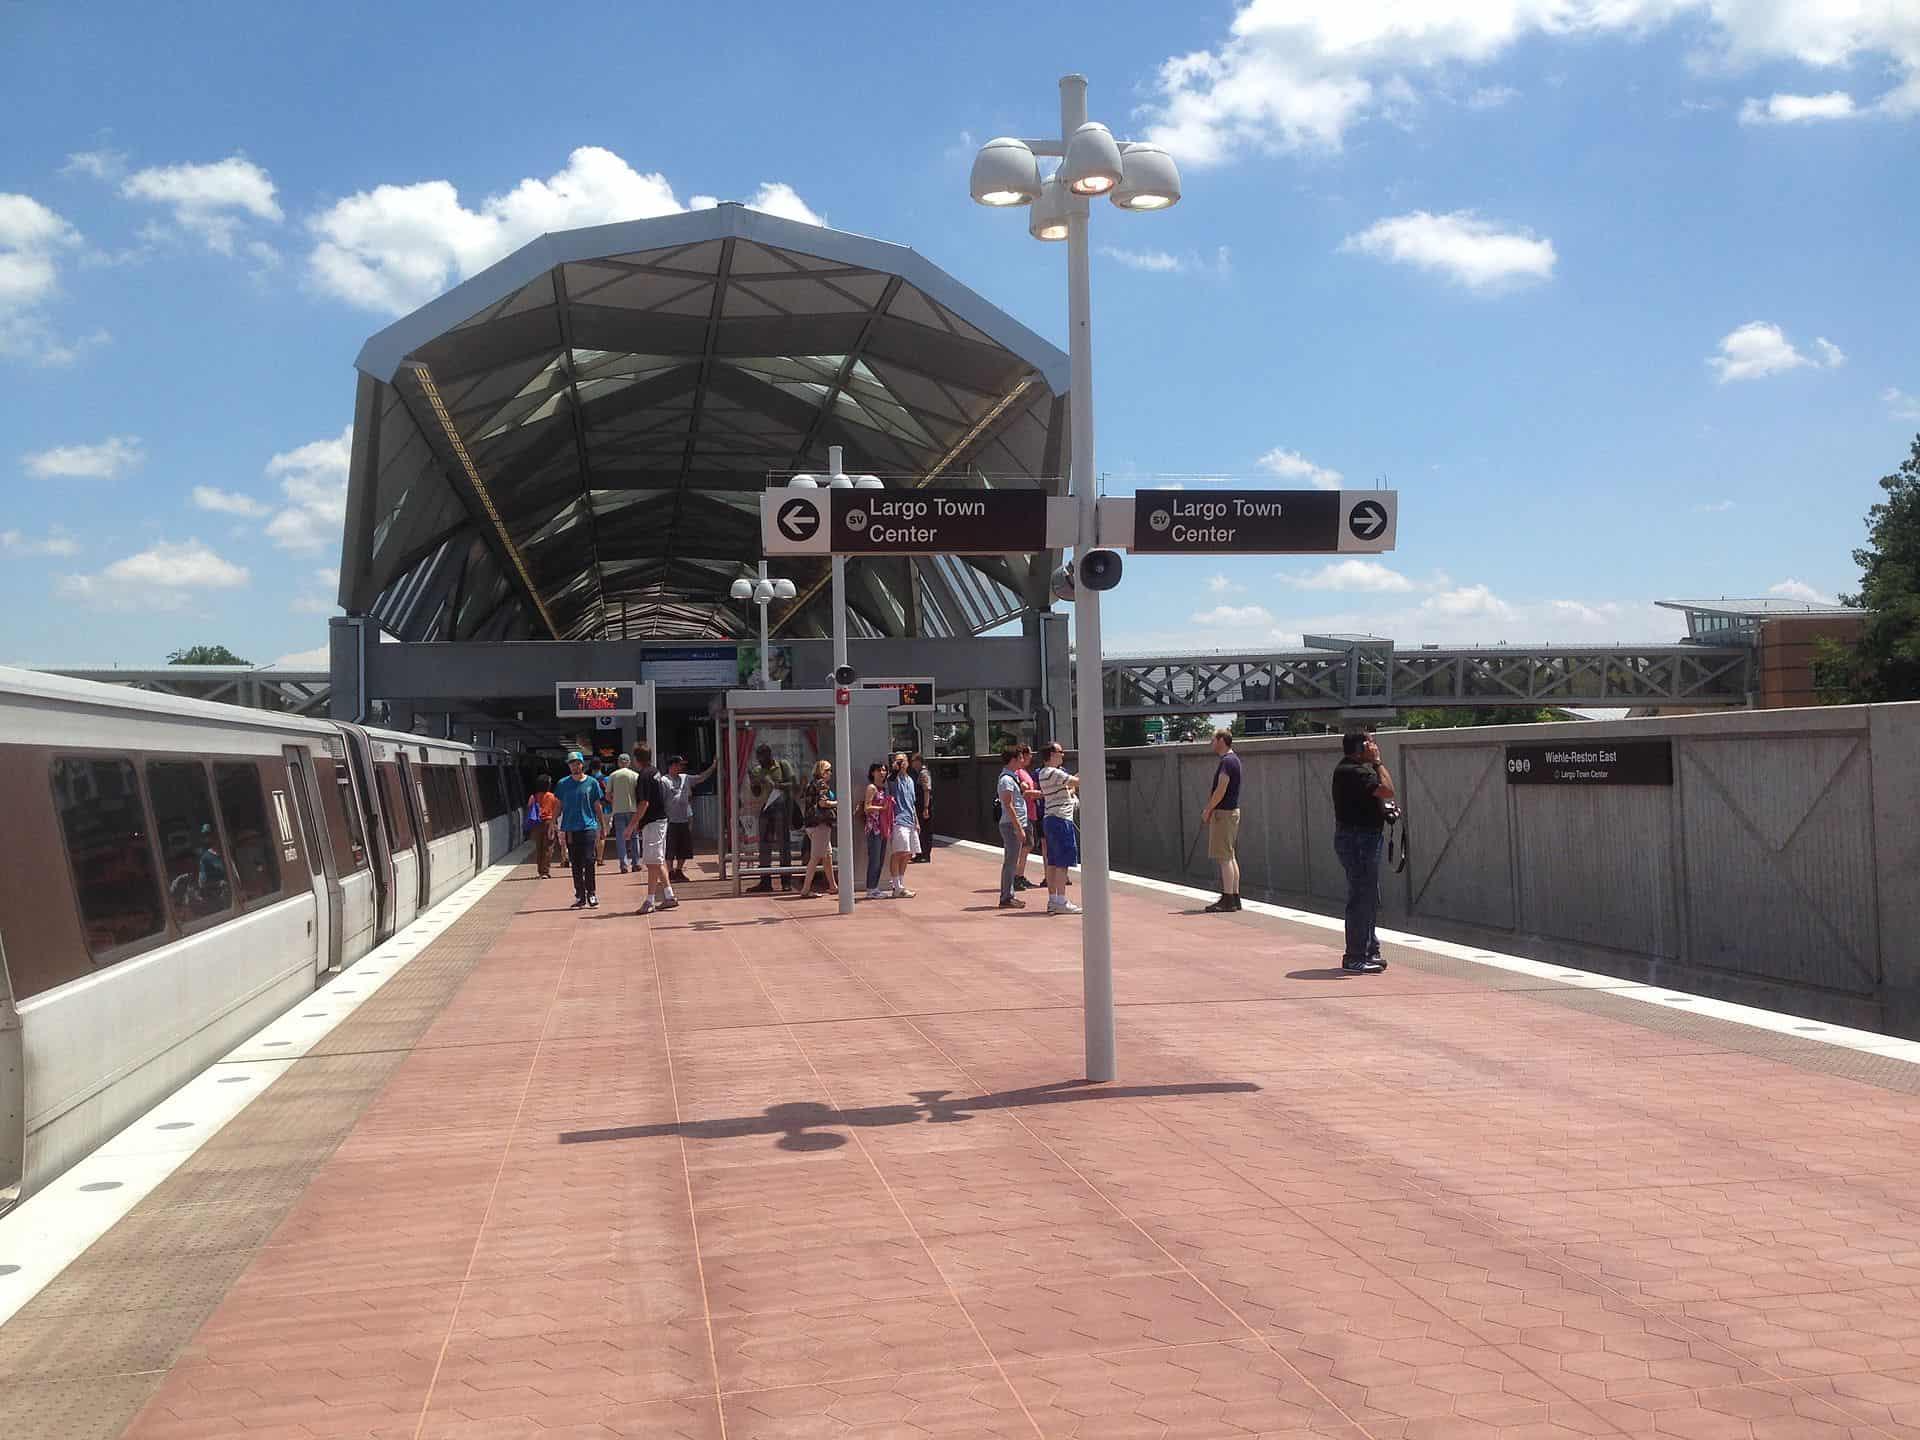 Dermal Science International Located 5 Minute Walk to Wiehle-Reston East Metro Station